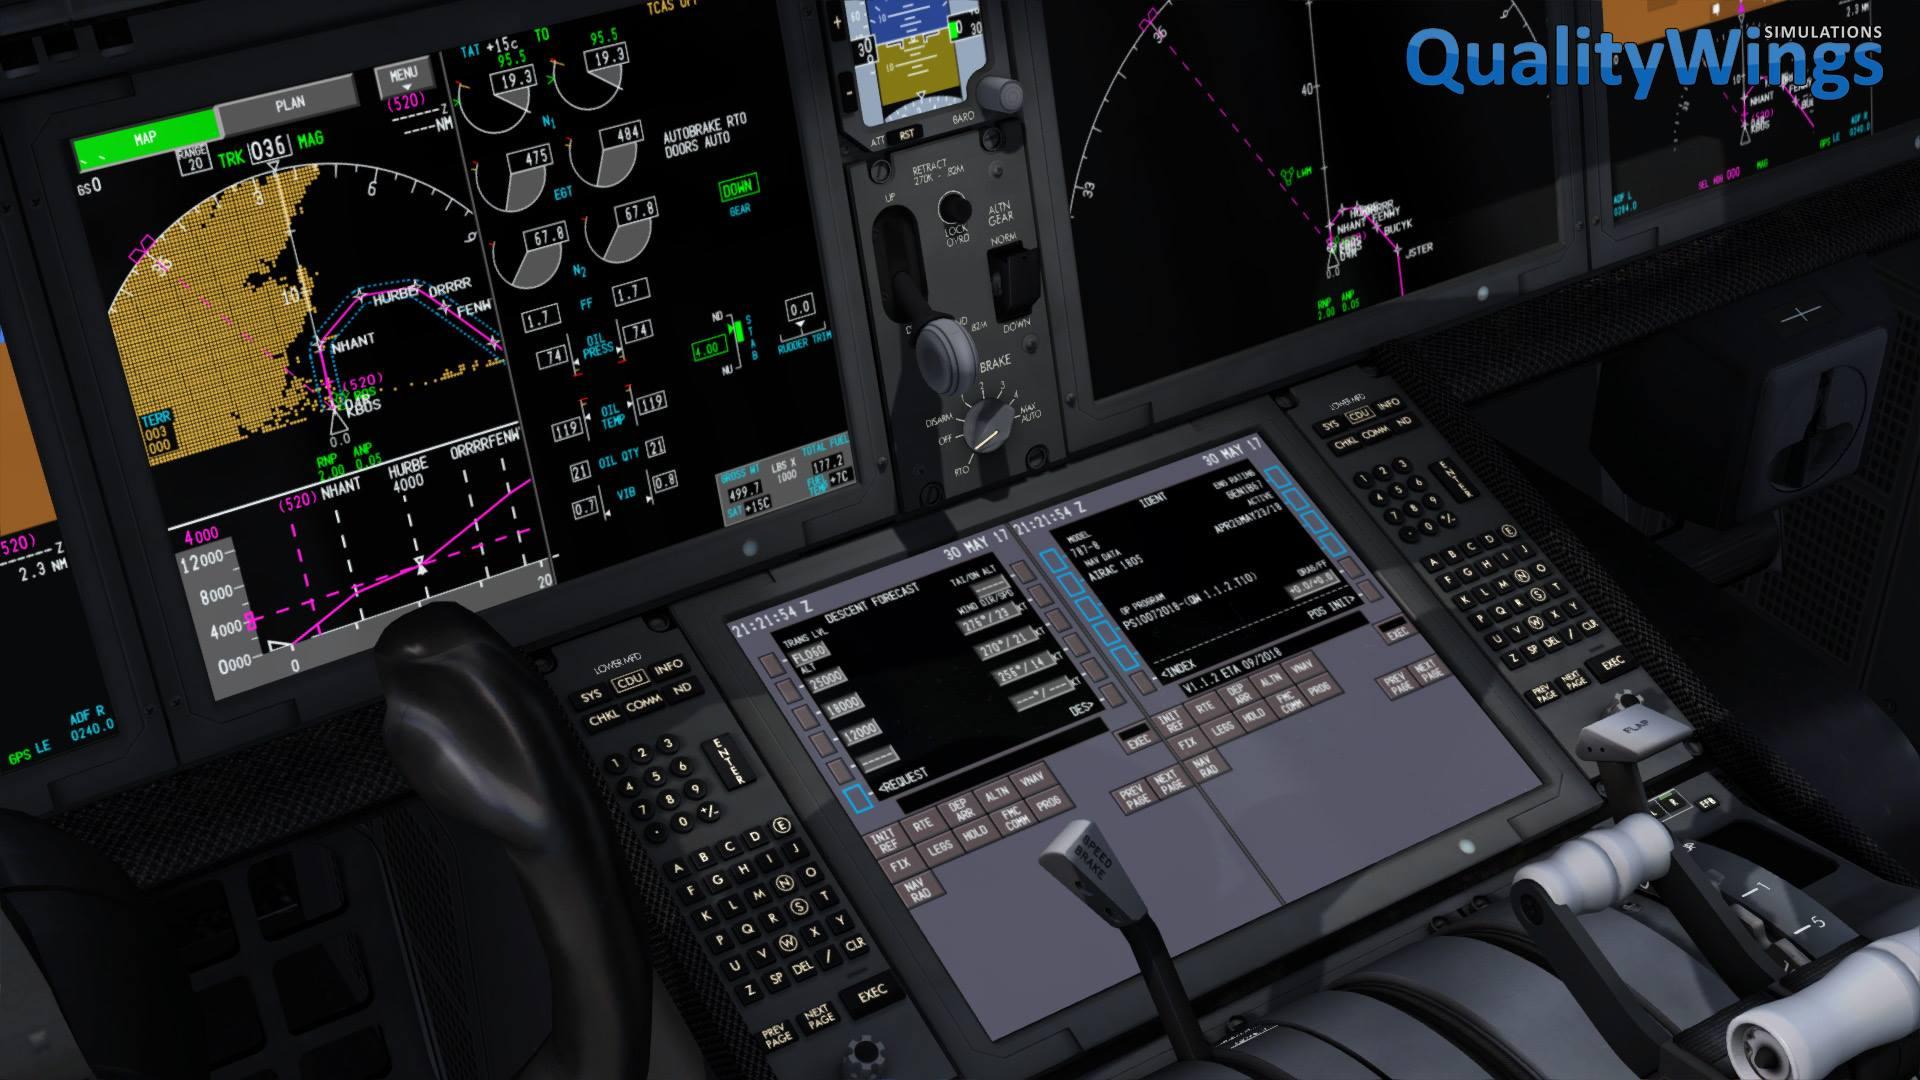 prepar3d / fsx] QualityWings Ultimate 787 1 1 2 Update Due